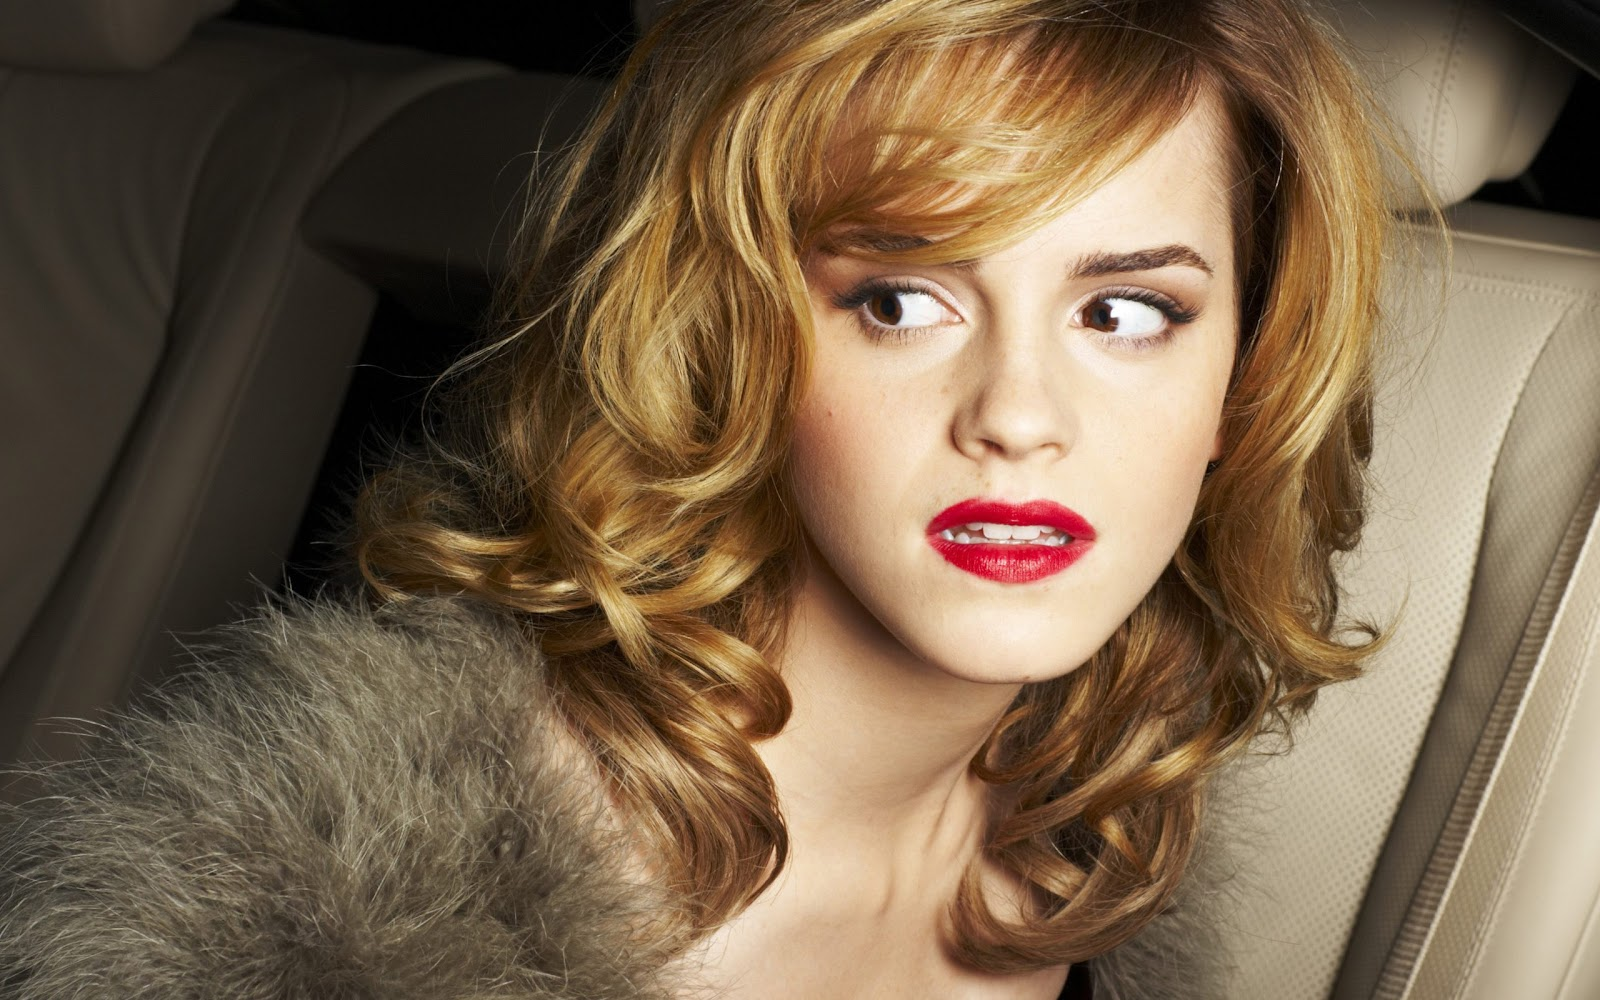 http://2.bp.blogspot.com/-OLdikQ5a4PY/TvhULL5KwfI/AAAAAAAAFmk/iqRyvUGUJuY/s1600/Emma+Watson+%25282560x1600%2529.jpg